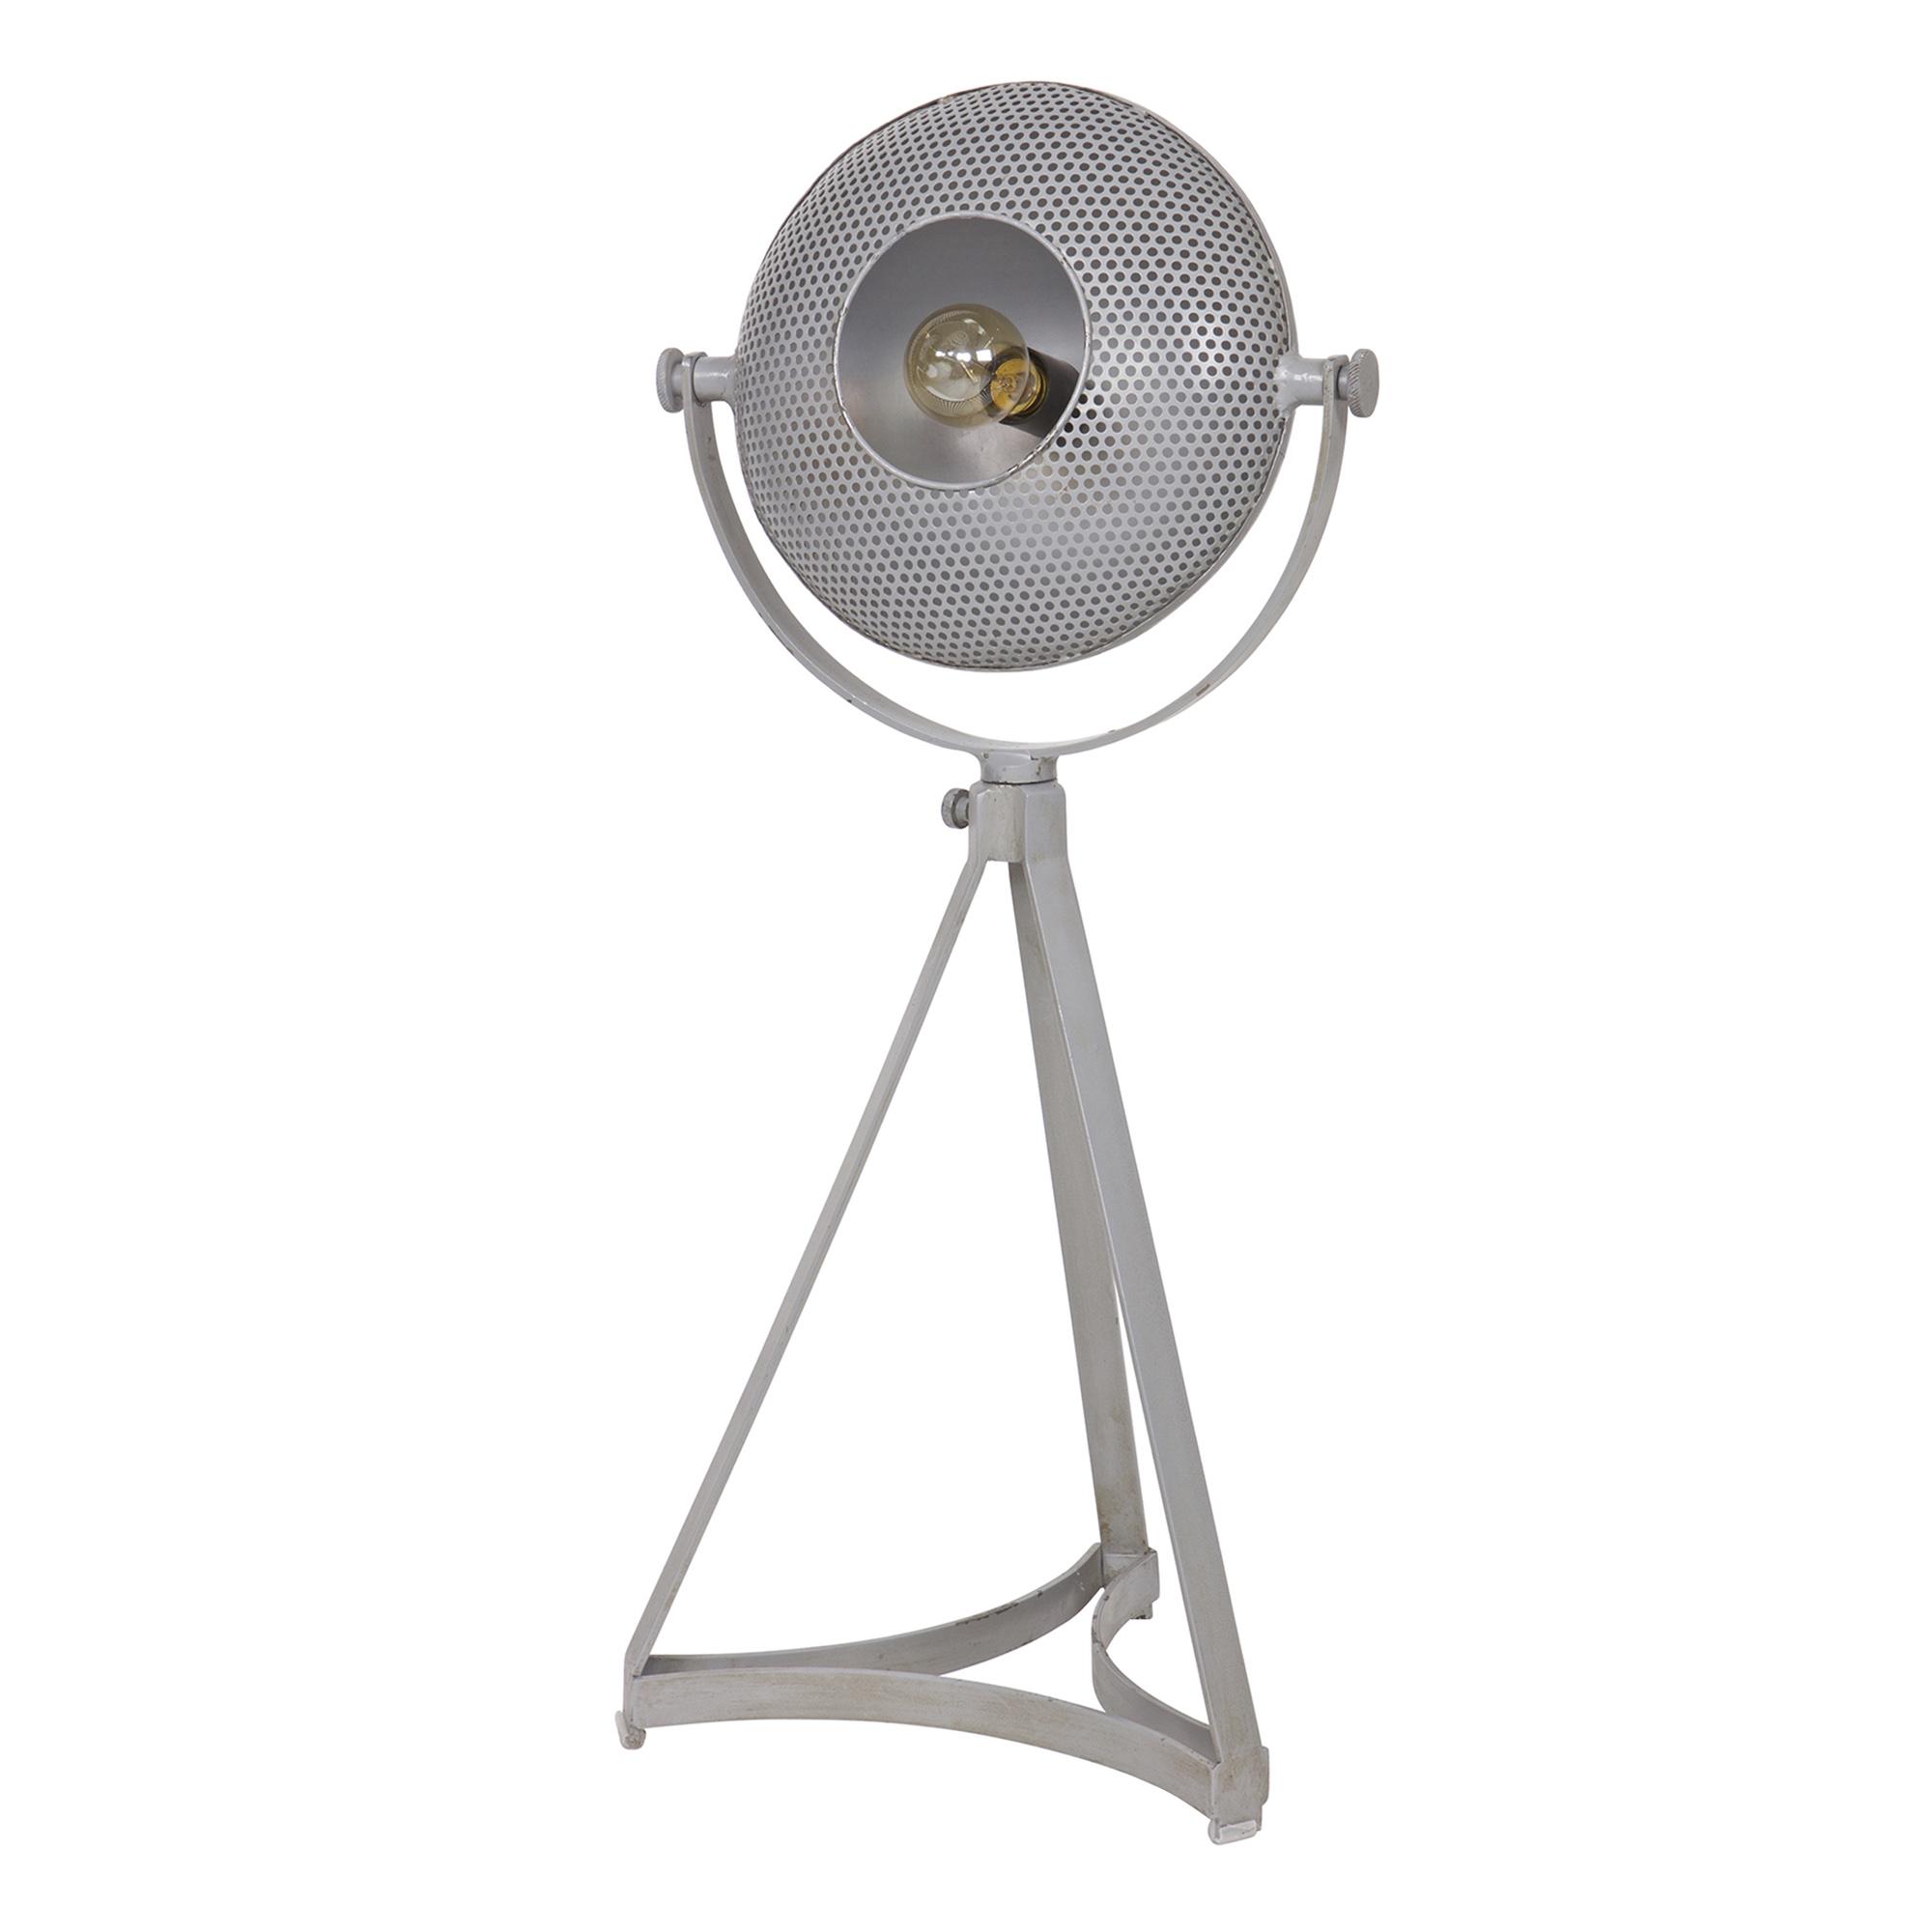 Tafellamp Blown metaal grijs